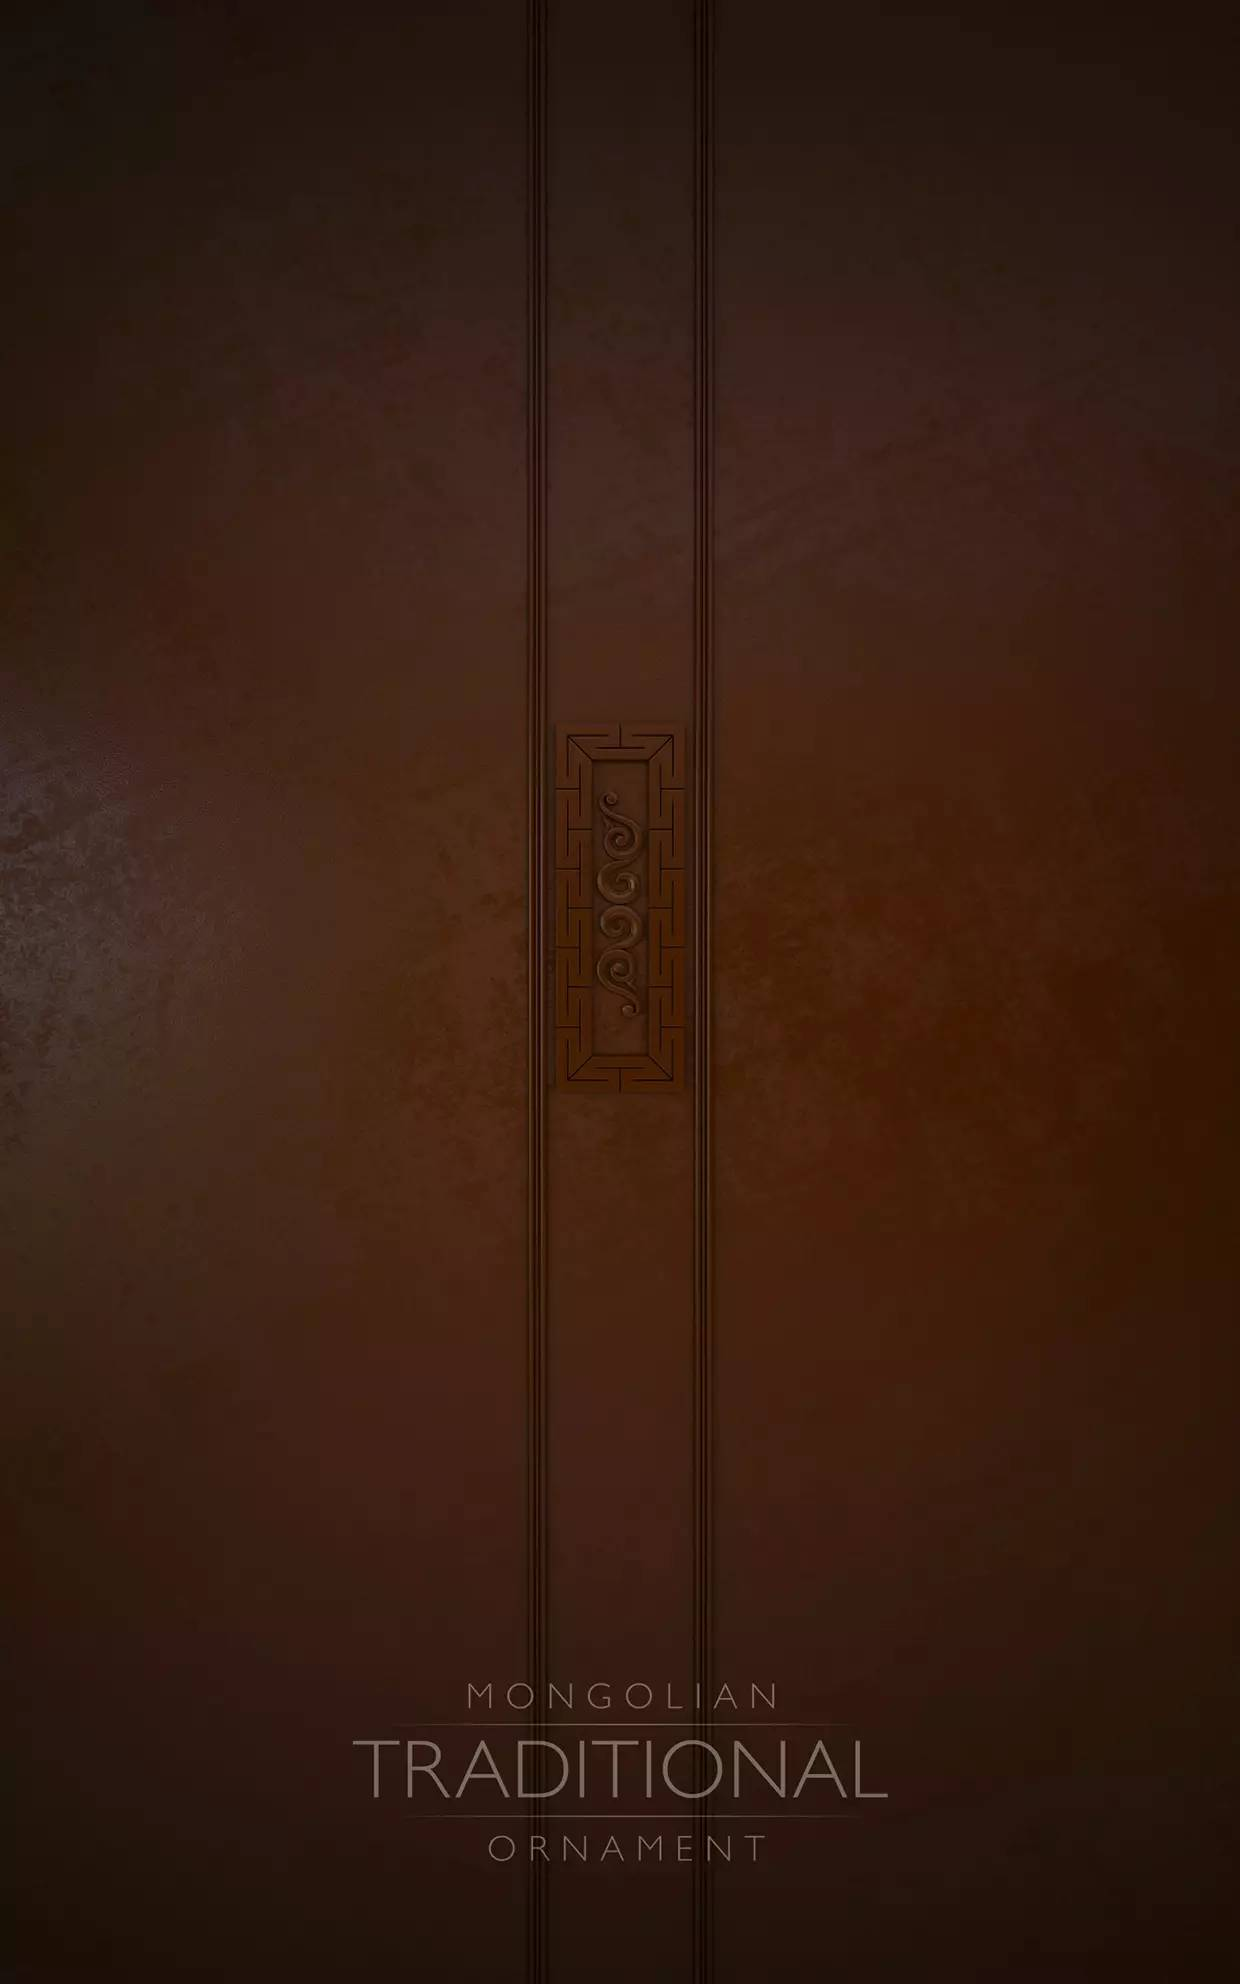 室内设计 蒙族传统装饰(Mongolian Traditional Ornament) 第10张